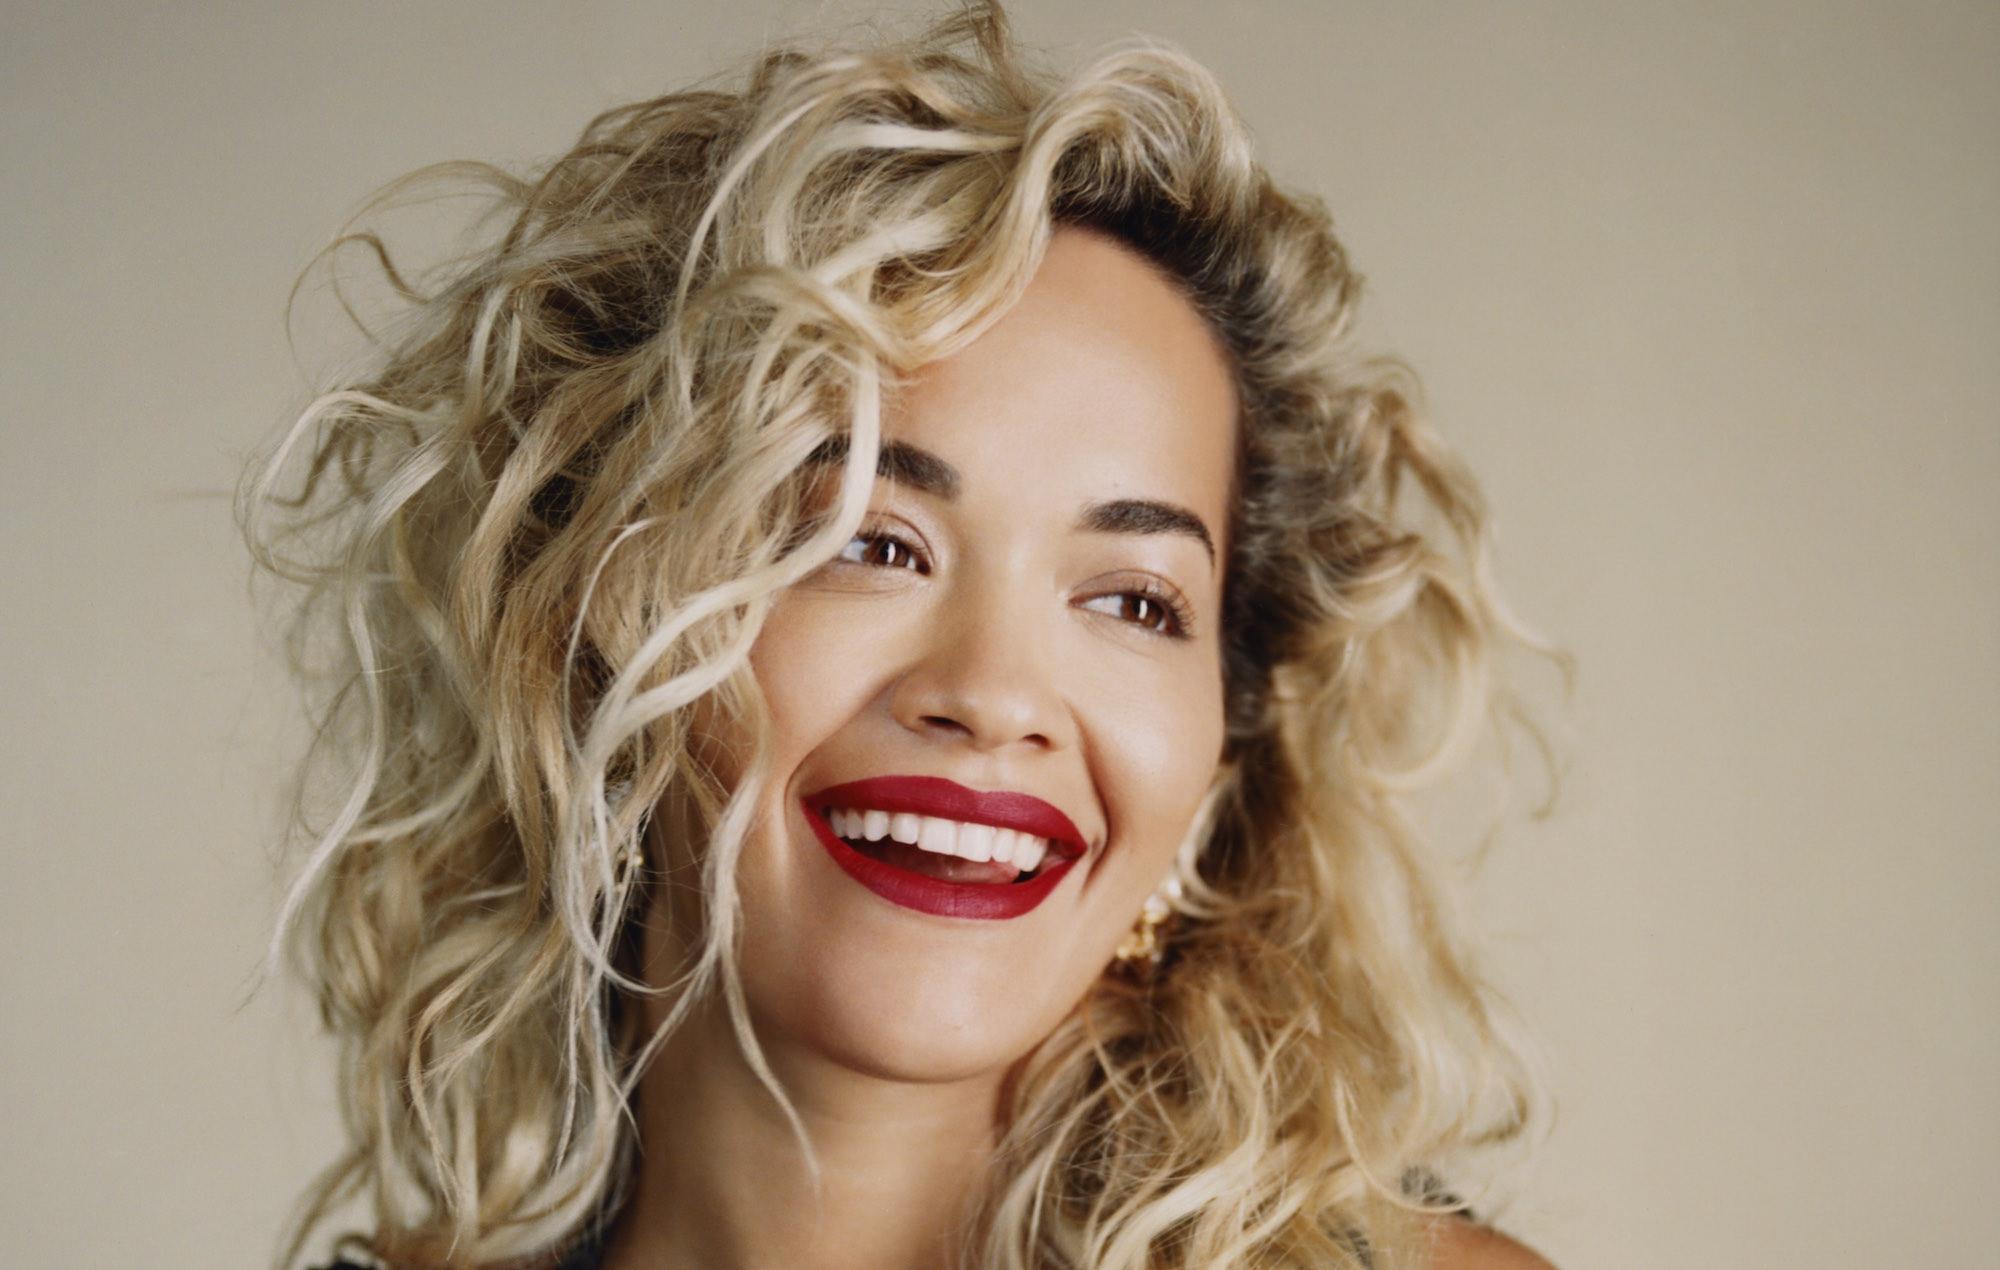 Rita Ora – 'Phoenix' Review